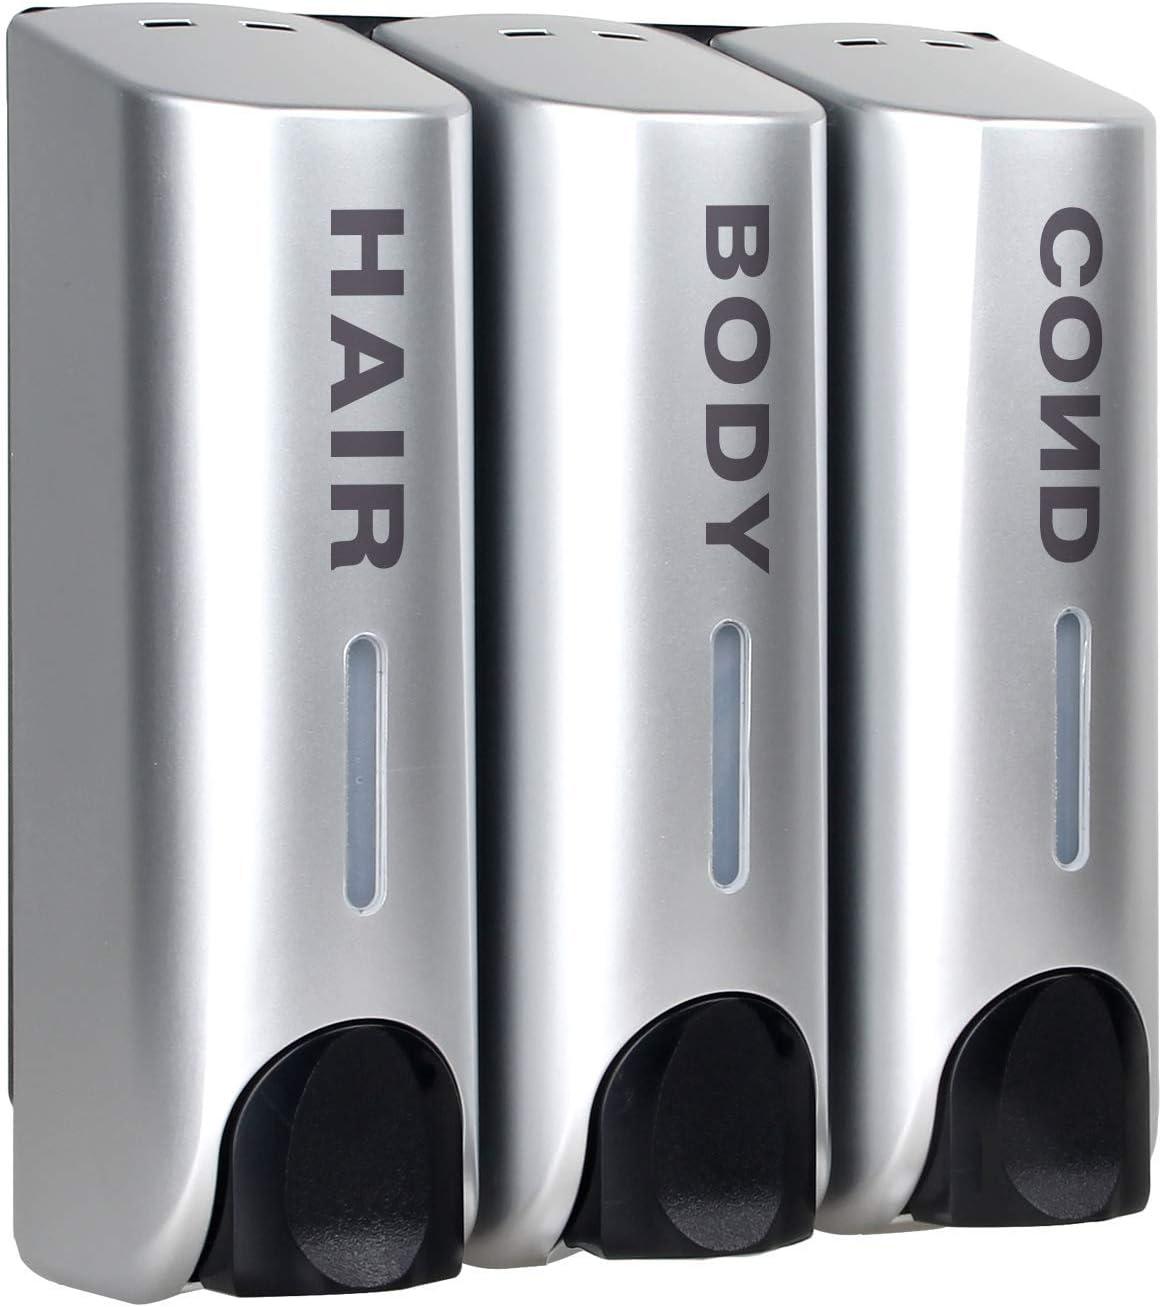 AUMIO Chamber Soap Dispenser Trio Shower Gel Shampoo Conditioner ABS Wall Mount Silver : Home & Kitchen